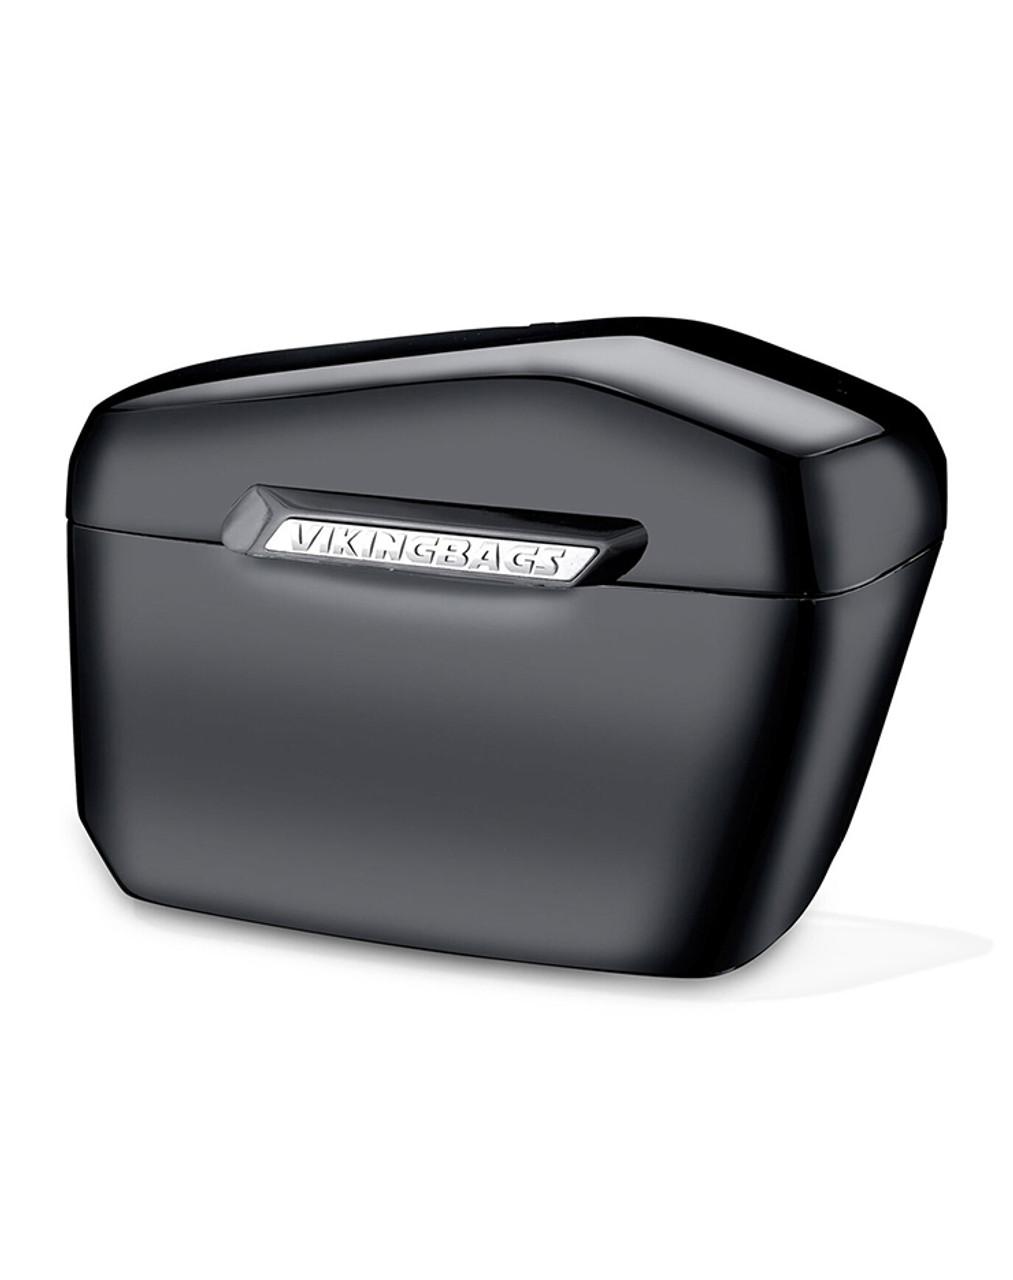 Yamaha Silverado Viking Lamellar Extra Large Black Hard Saddlebags Main Bag View